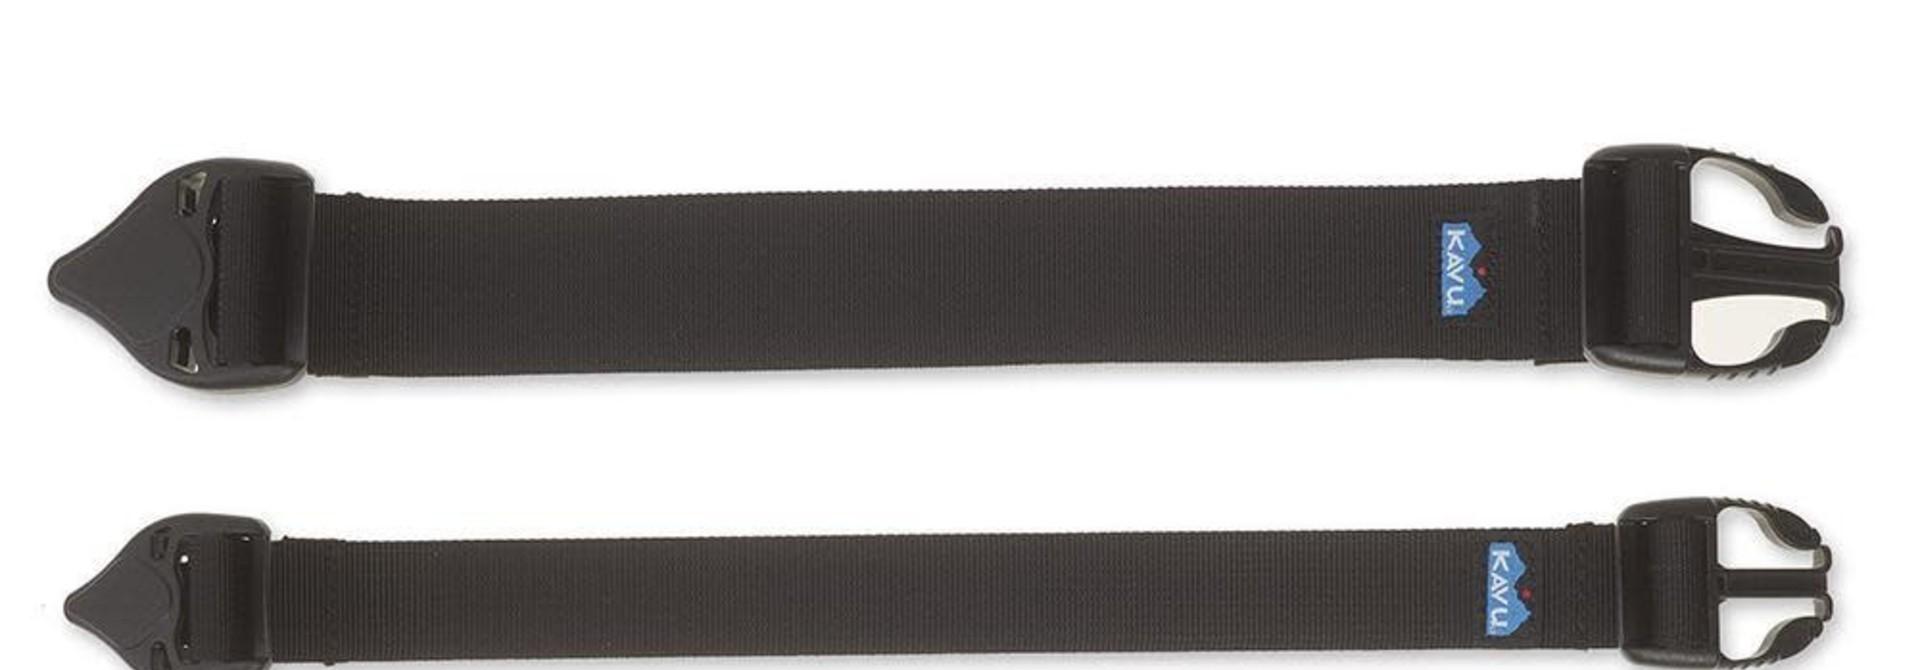 Strap Extension, Black